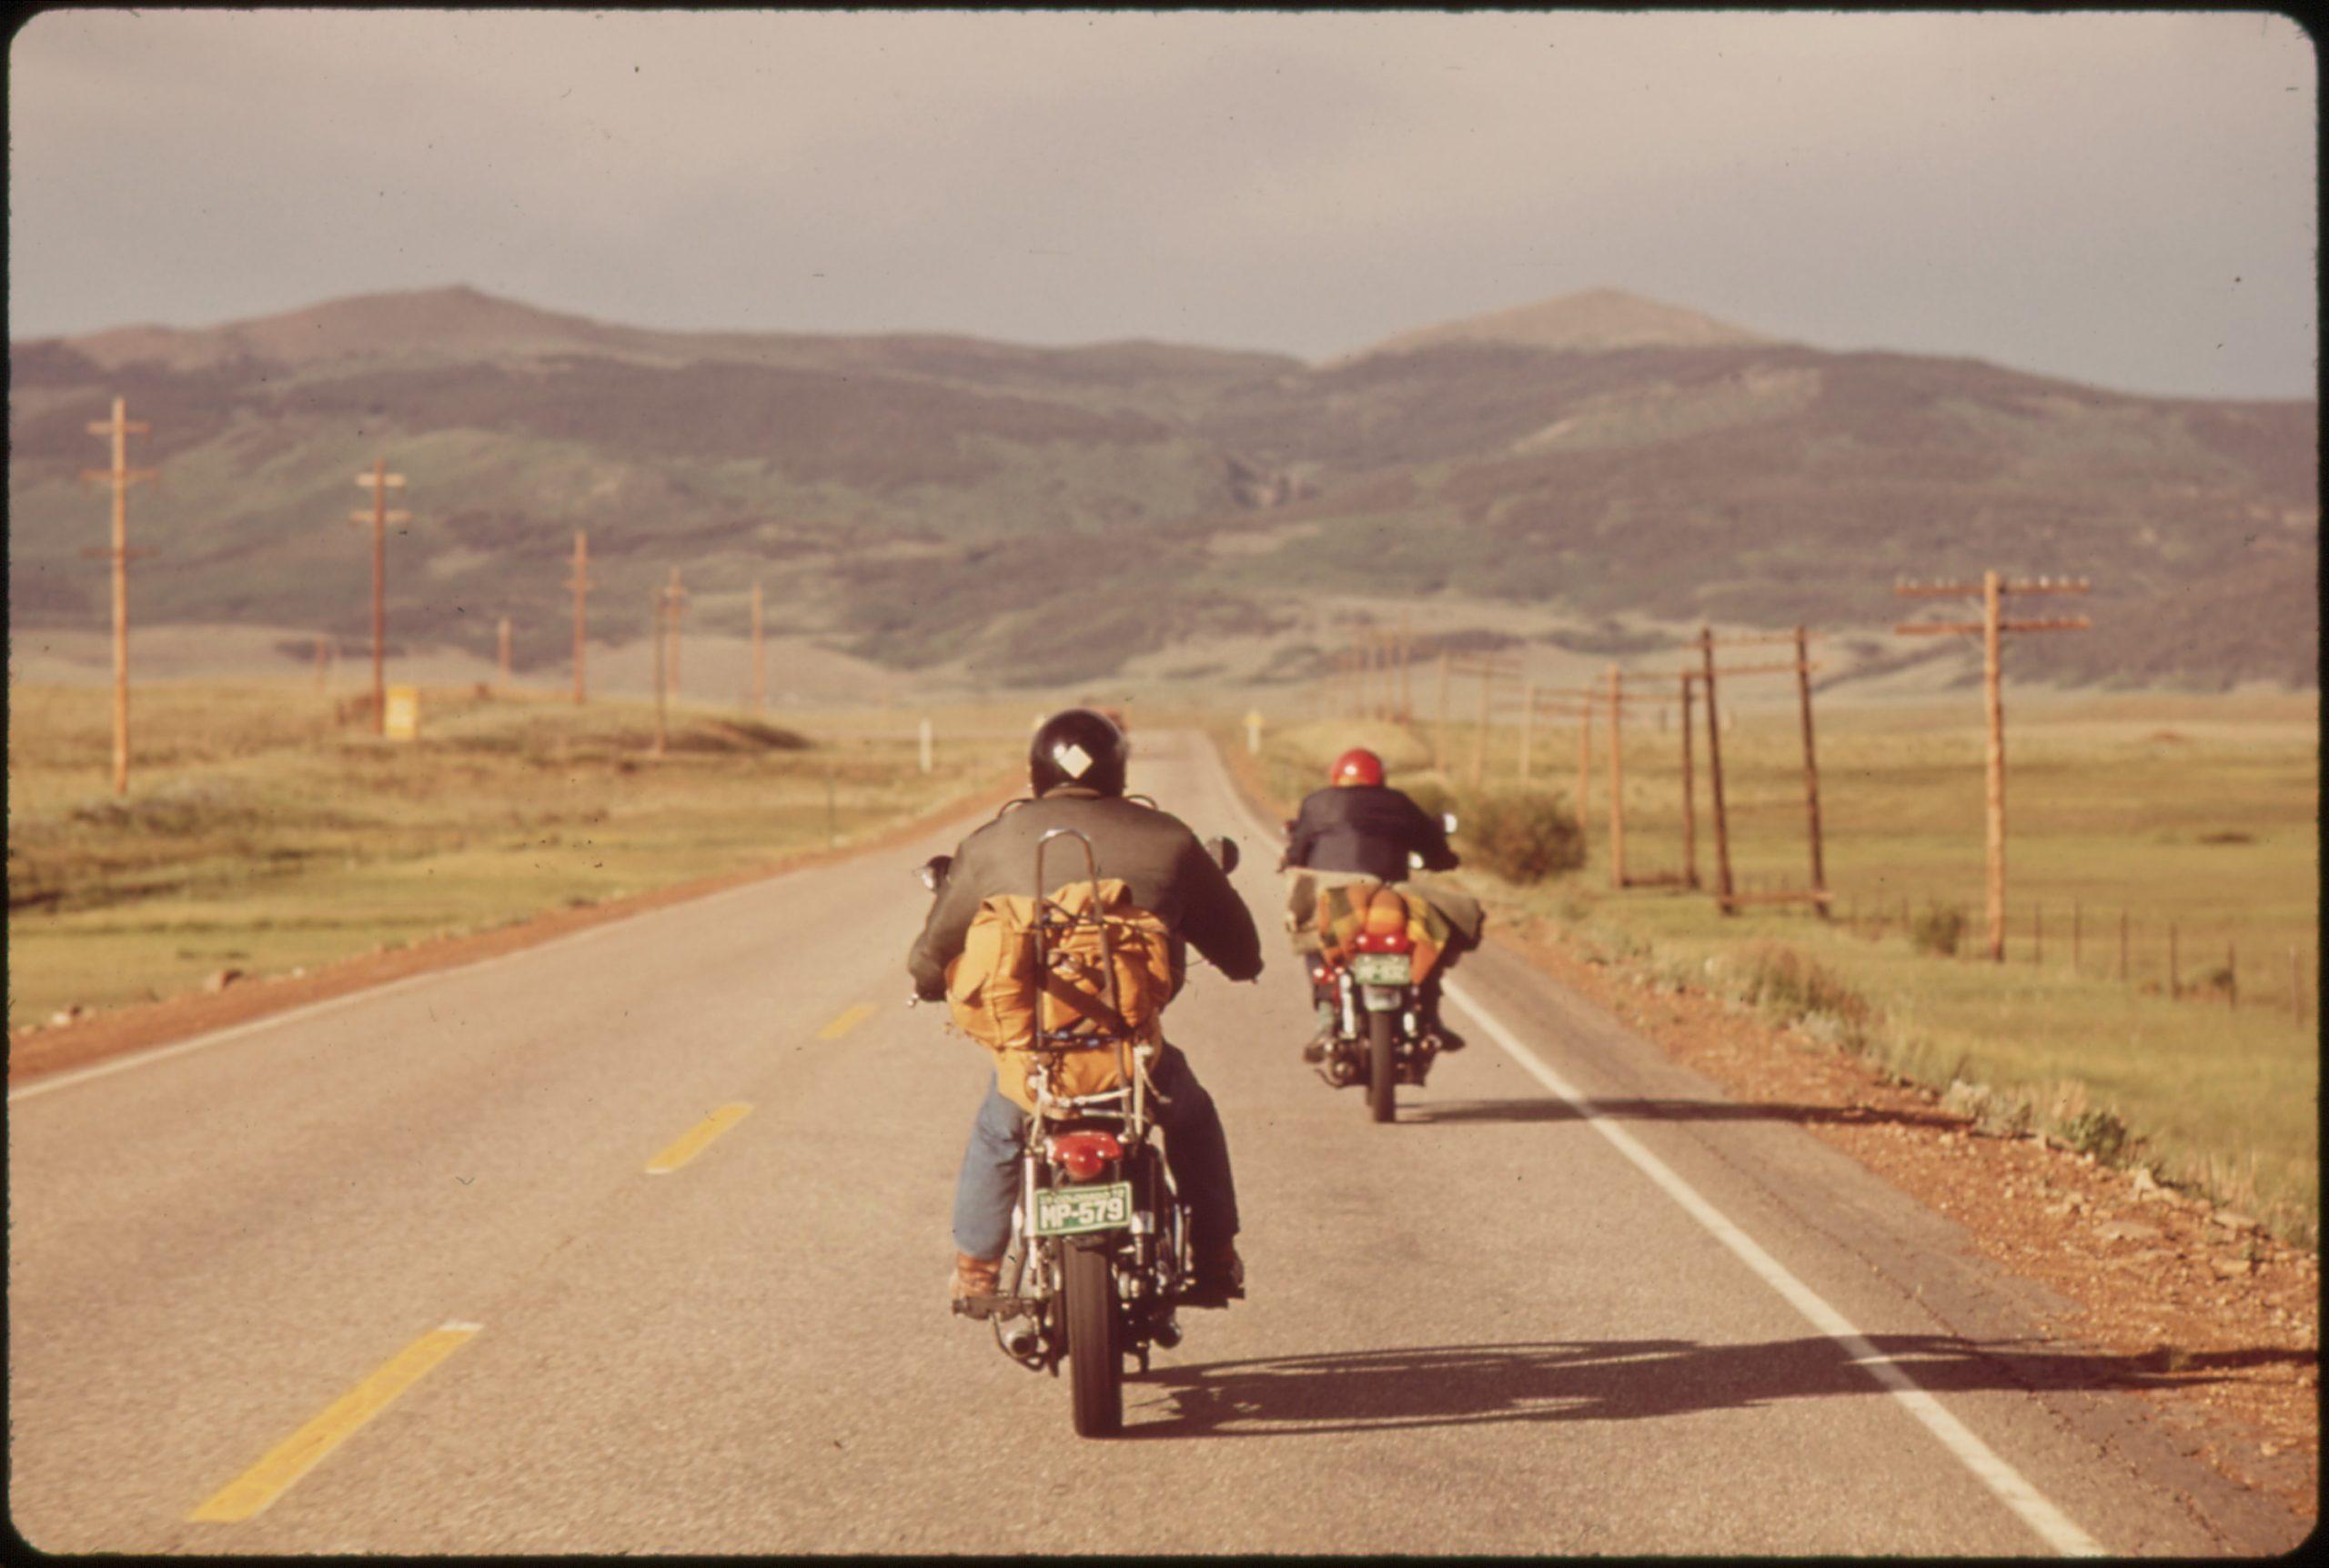 two men ride motorcycles